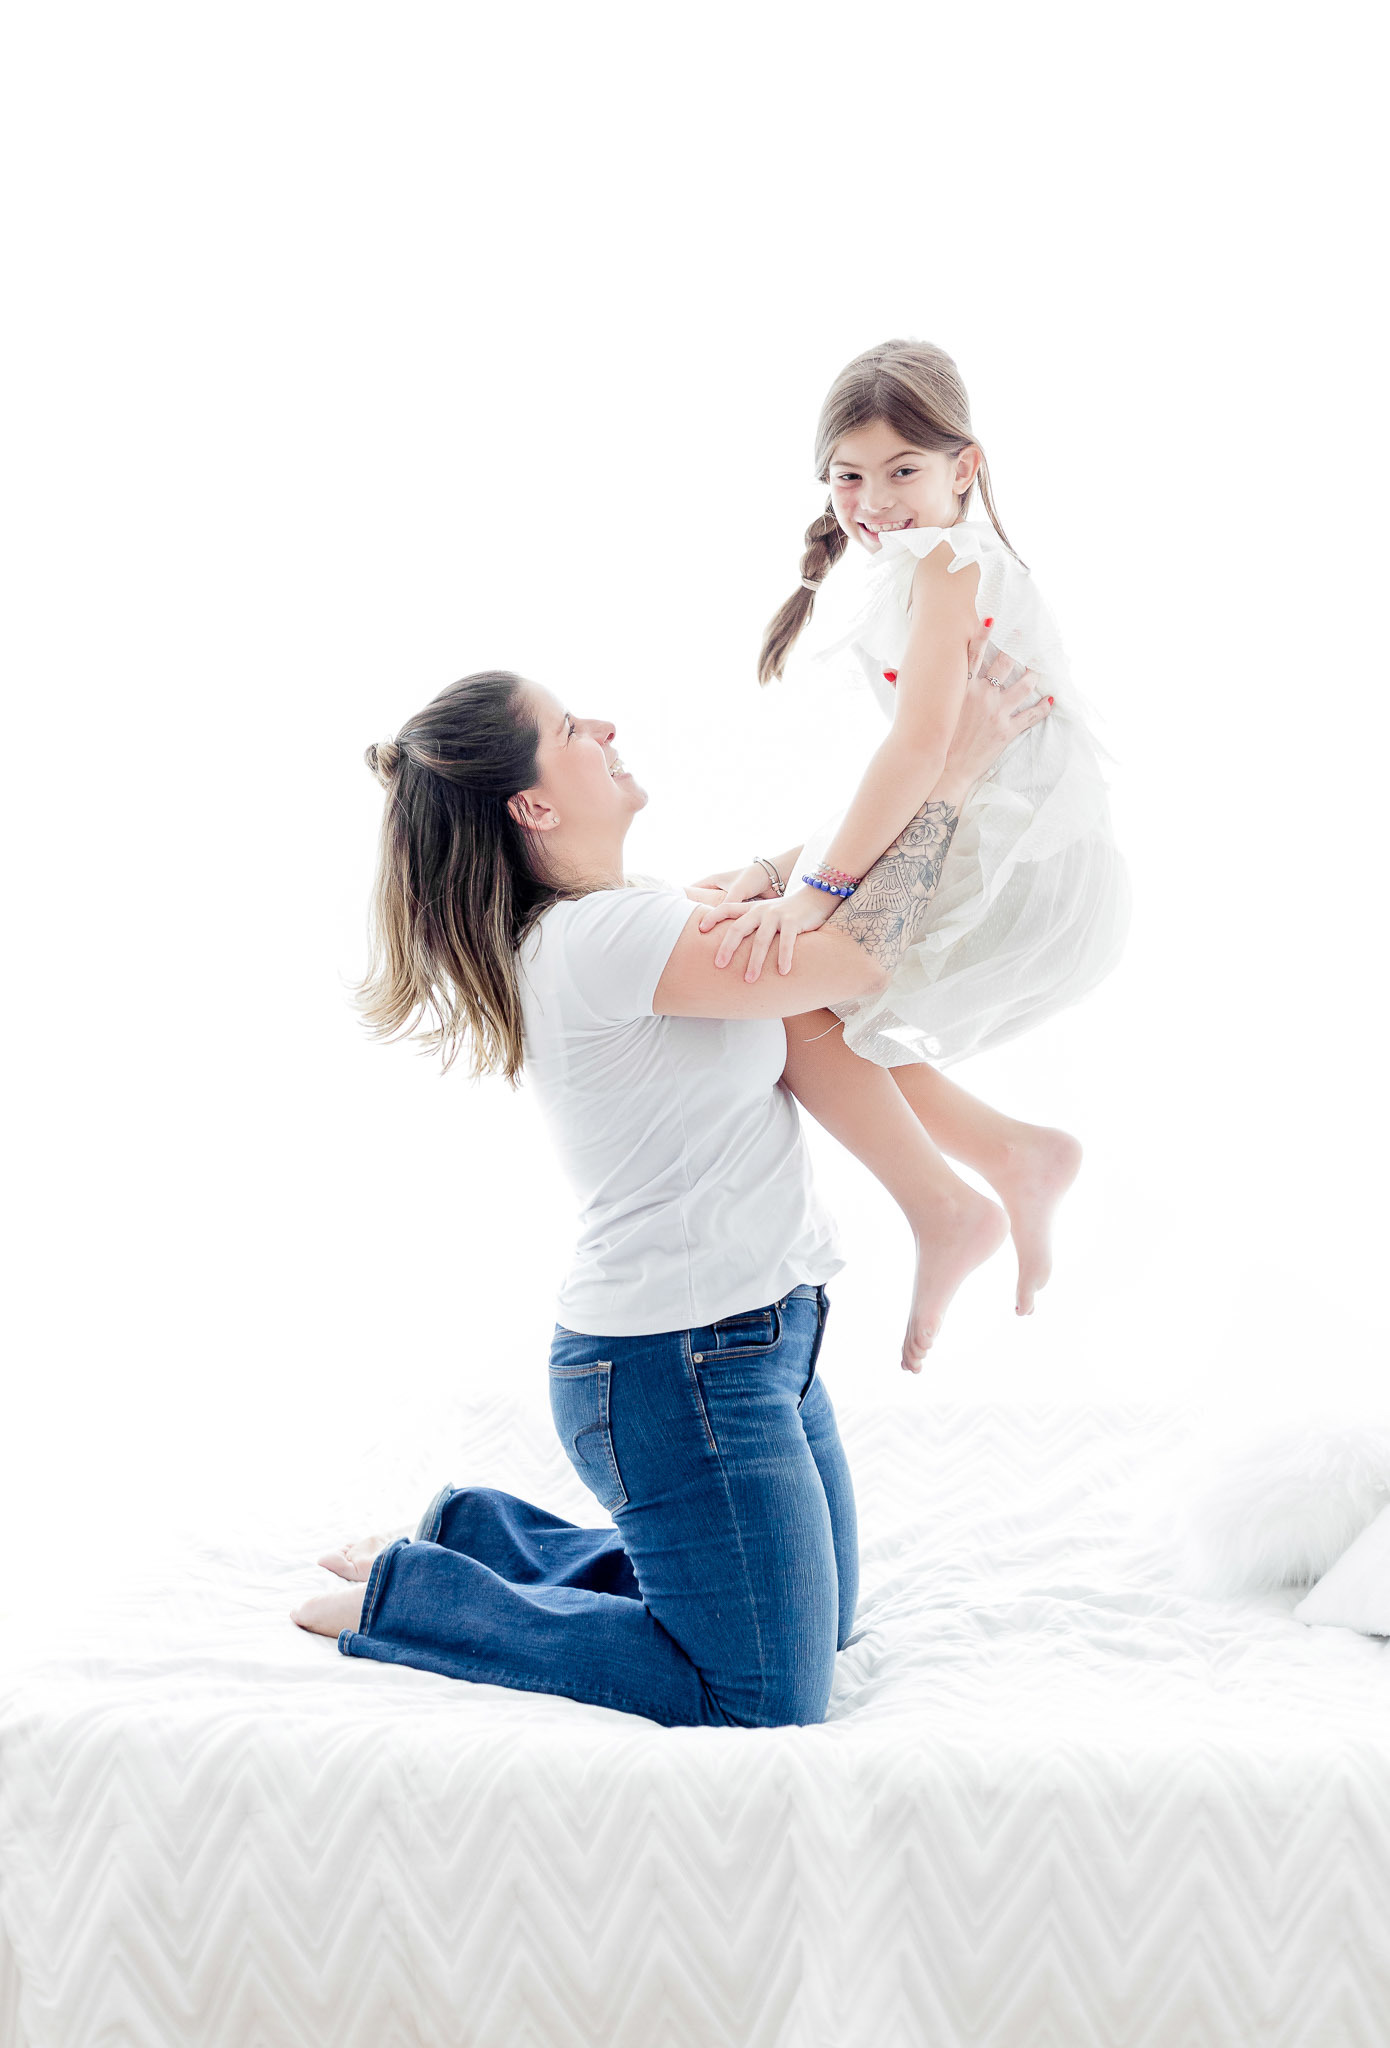 Sobre Ensaio fotográfico de famílias e gestantes na Barra da Tijuca | Teca Avelar